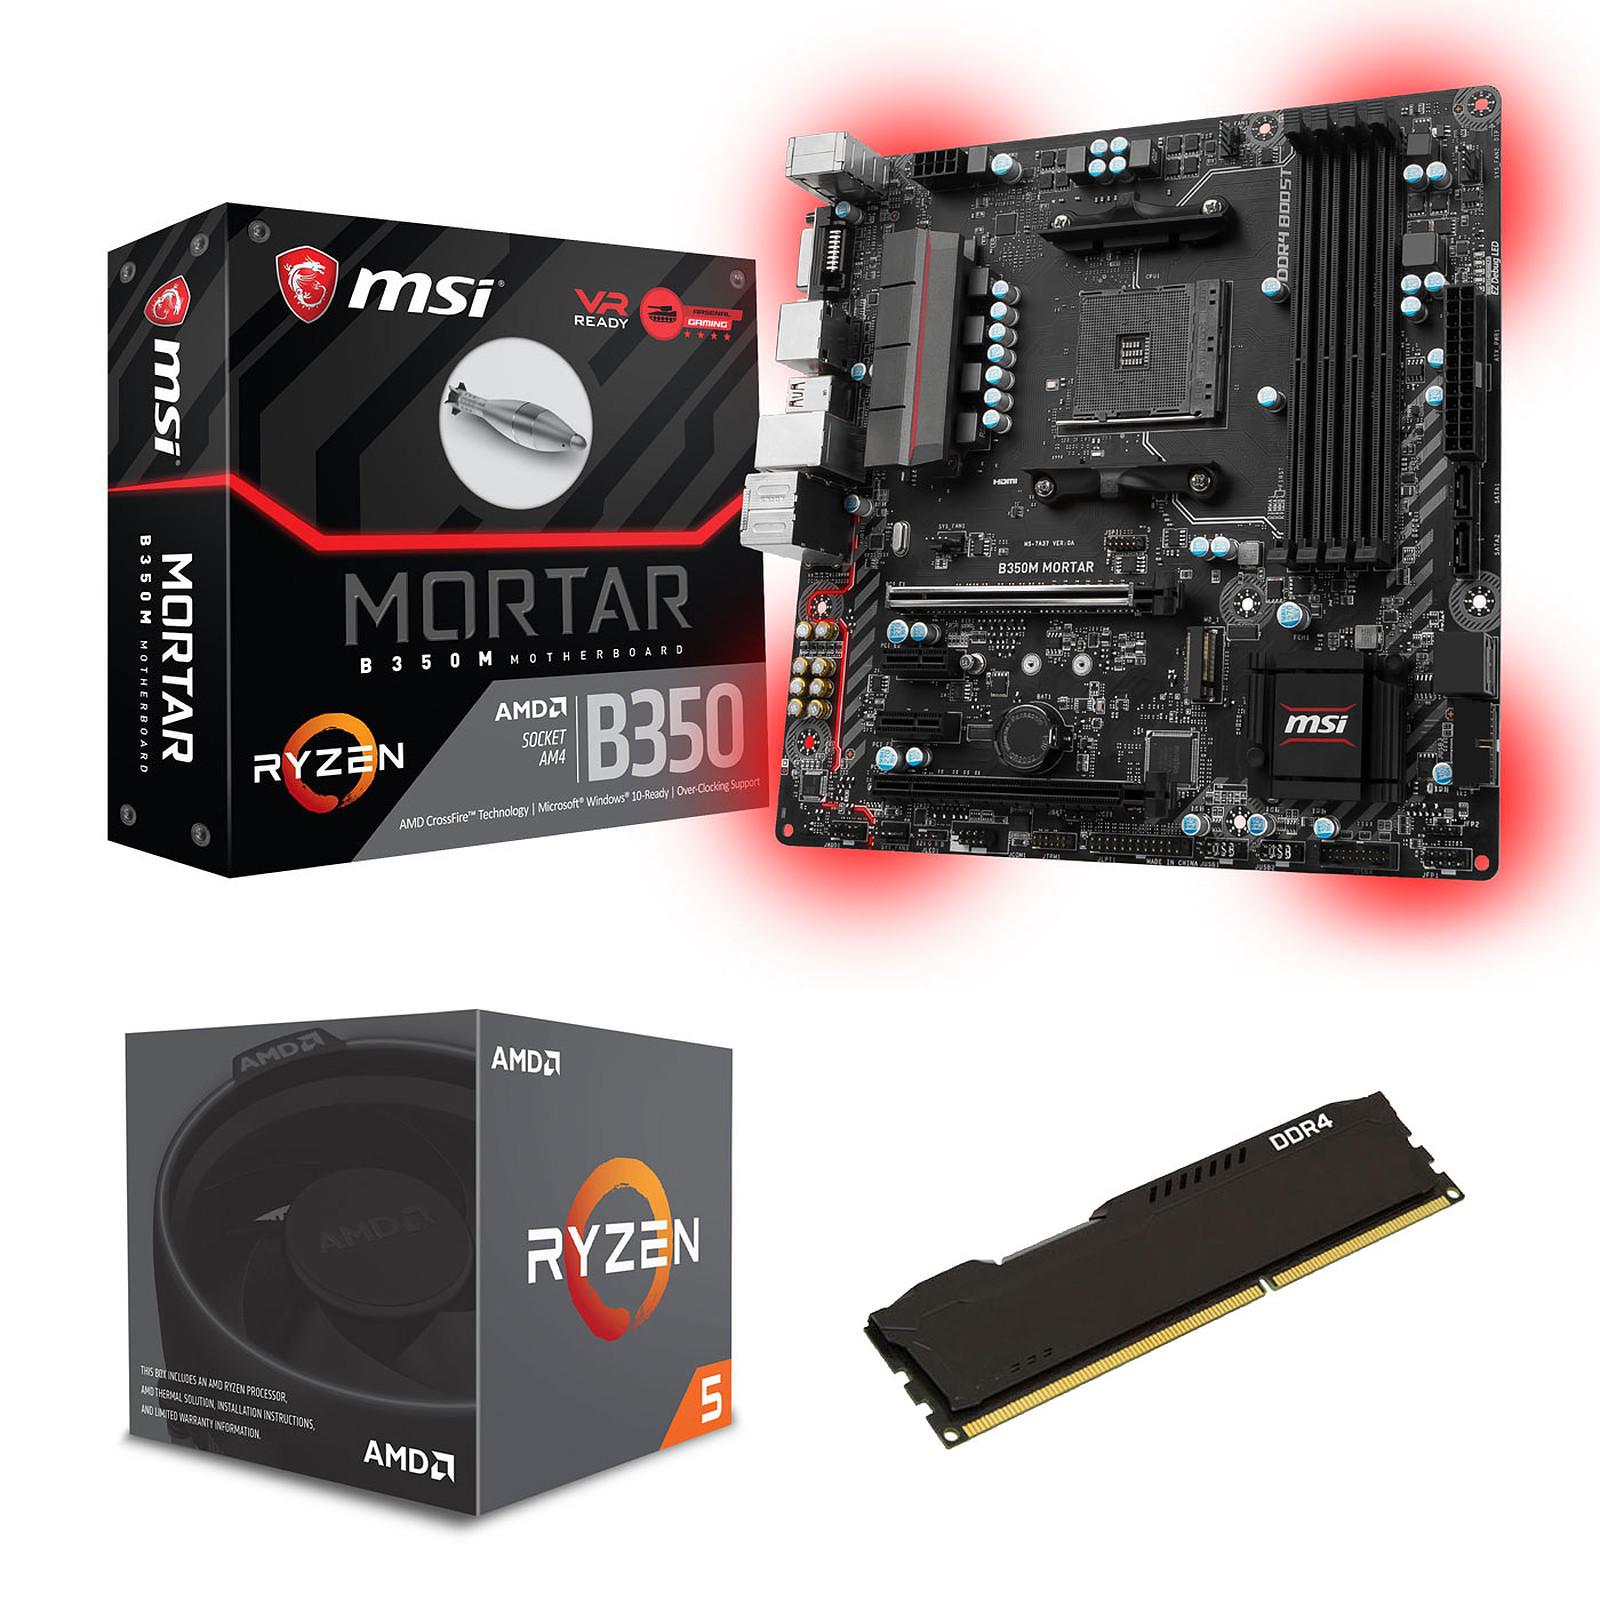 Kit Upgrade PC AMD Ryzen 5 1600 MSI B350M MORTAR 8 Go